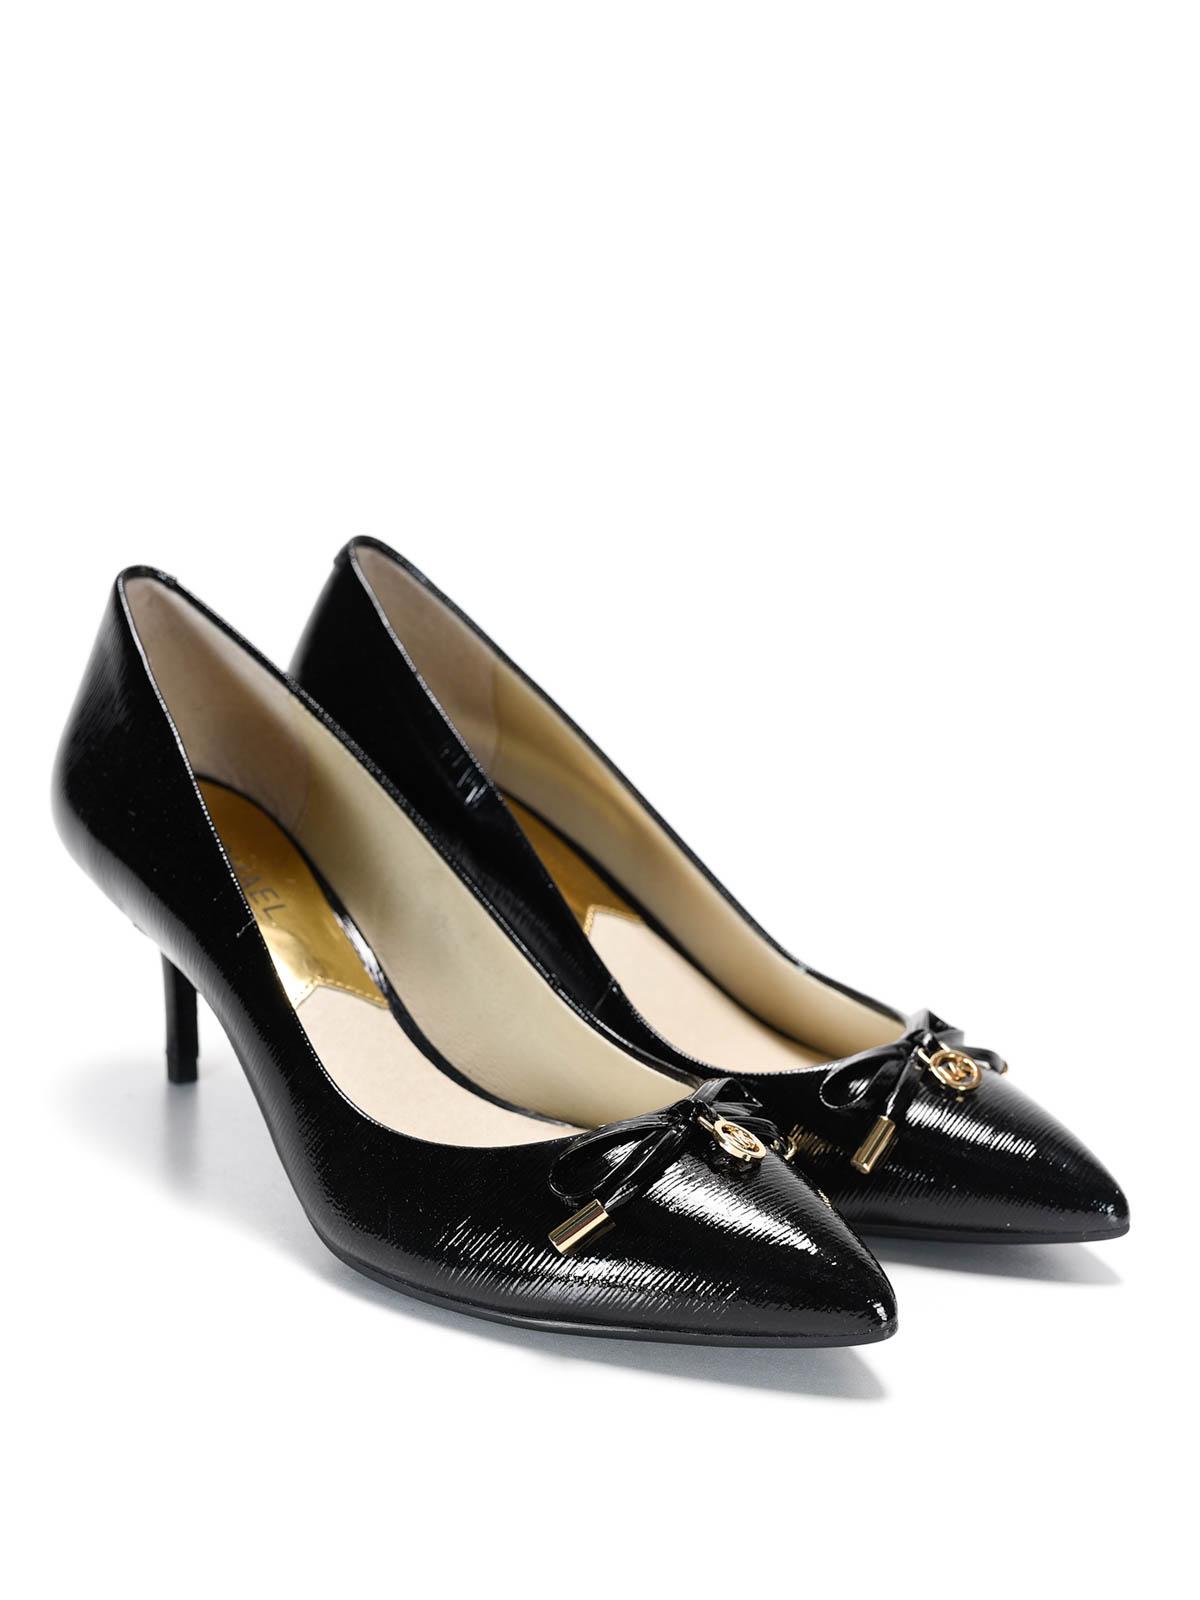 nancy mid pumps by michael kors court shoes ikrix. Black Bedroom Furniture Sets. Home Design Ideas